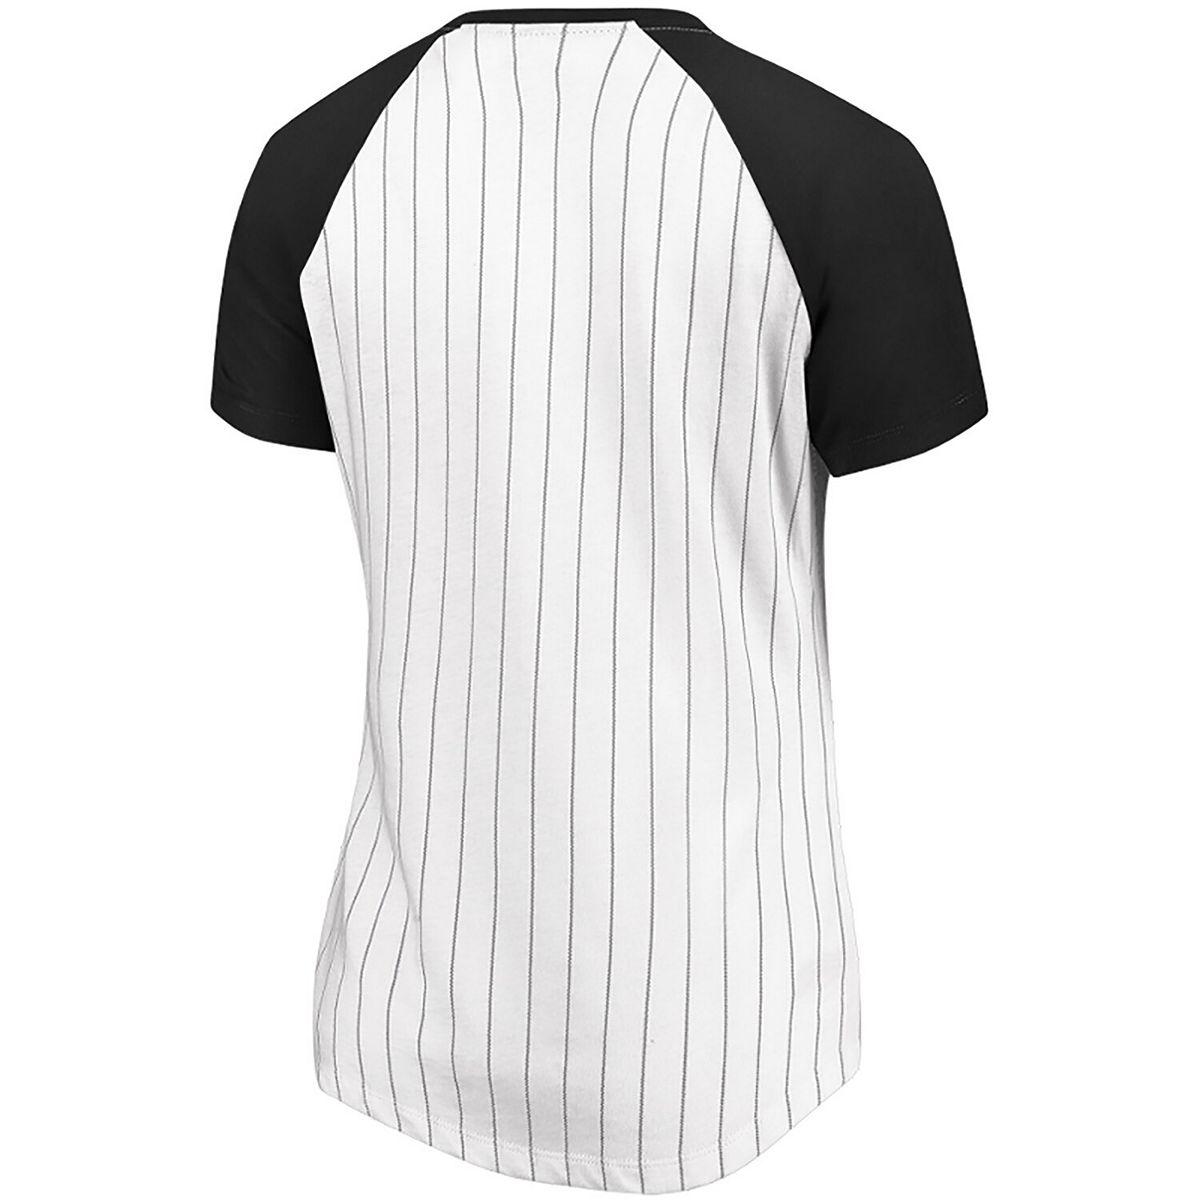 Women's Majestic White Oakland Athletics Every Aspect Pinstripe Raglan V-Neck T-Shirt eViWy